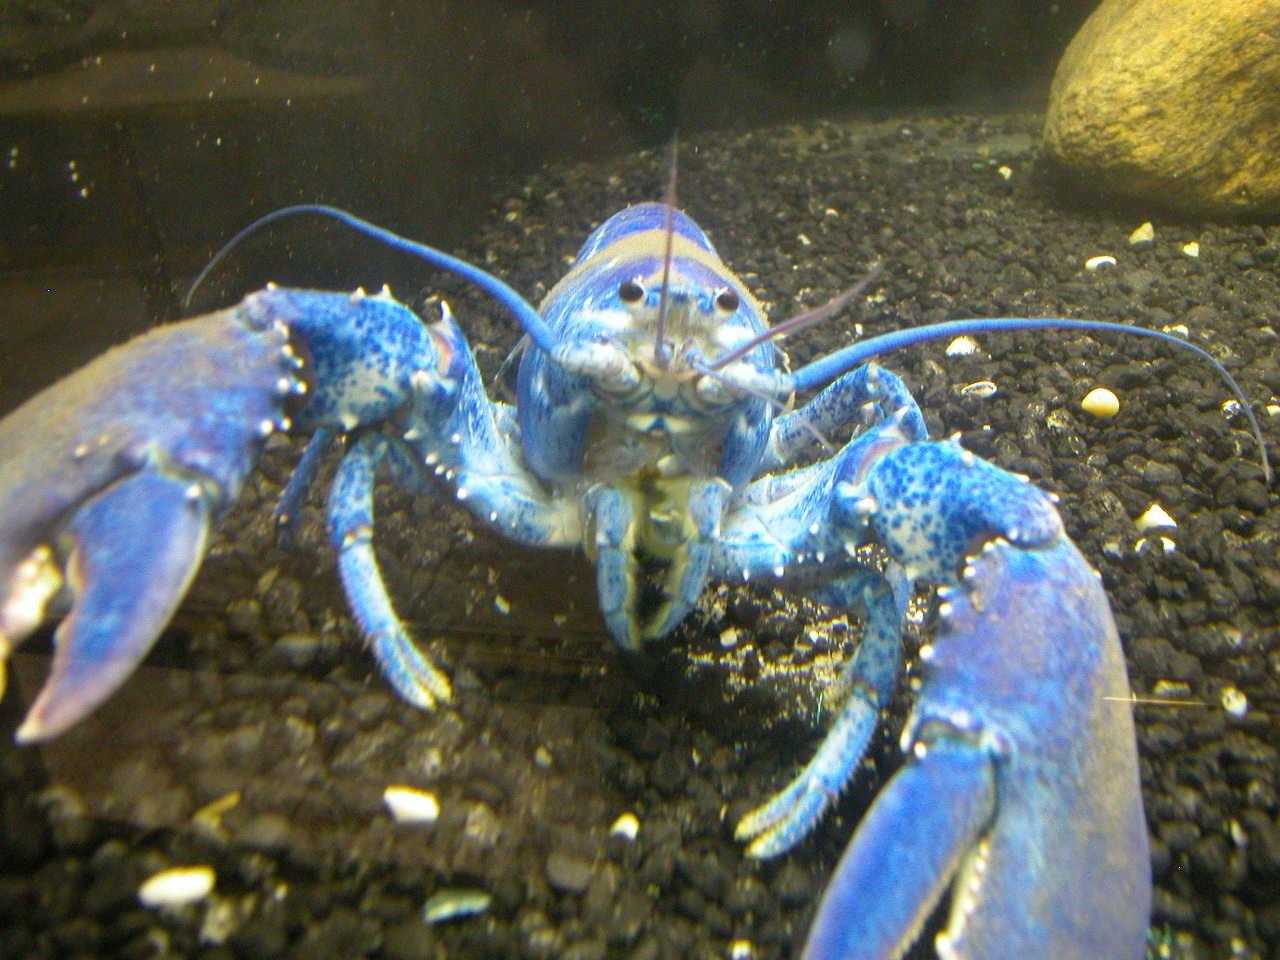 blue lobster looking at camera